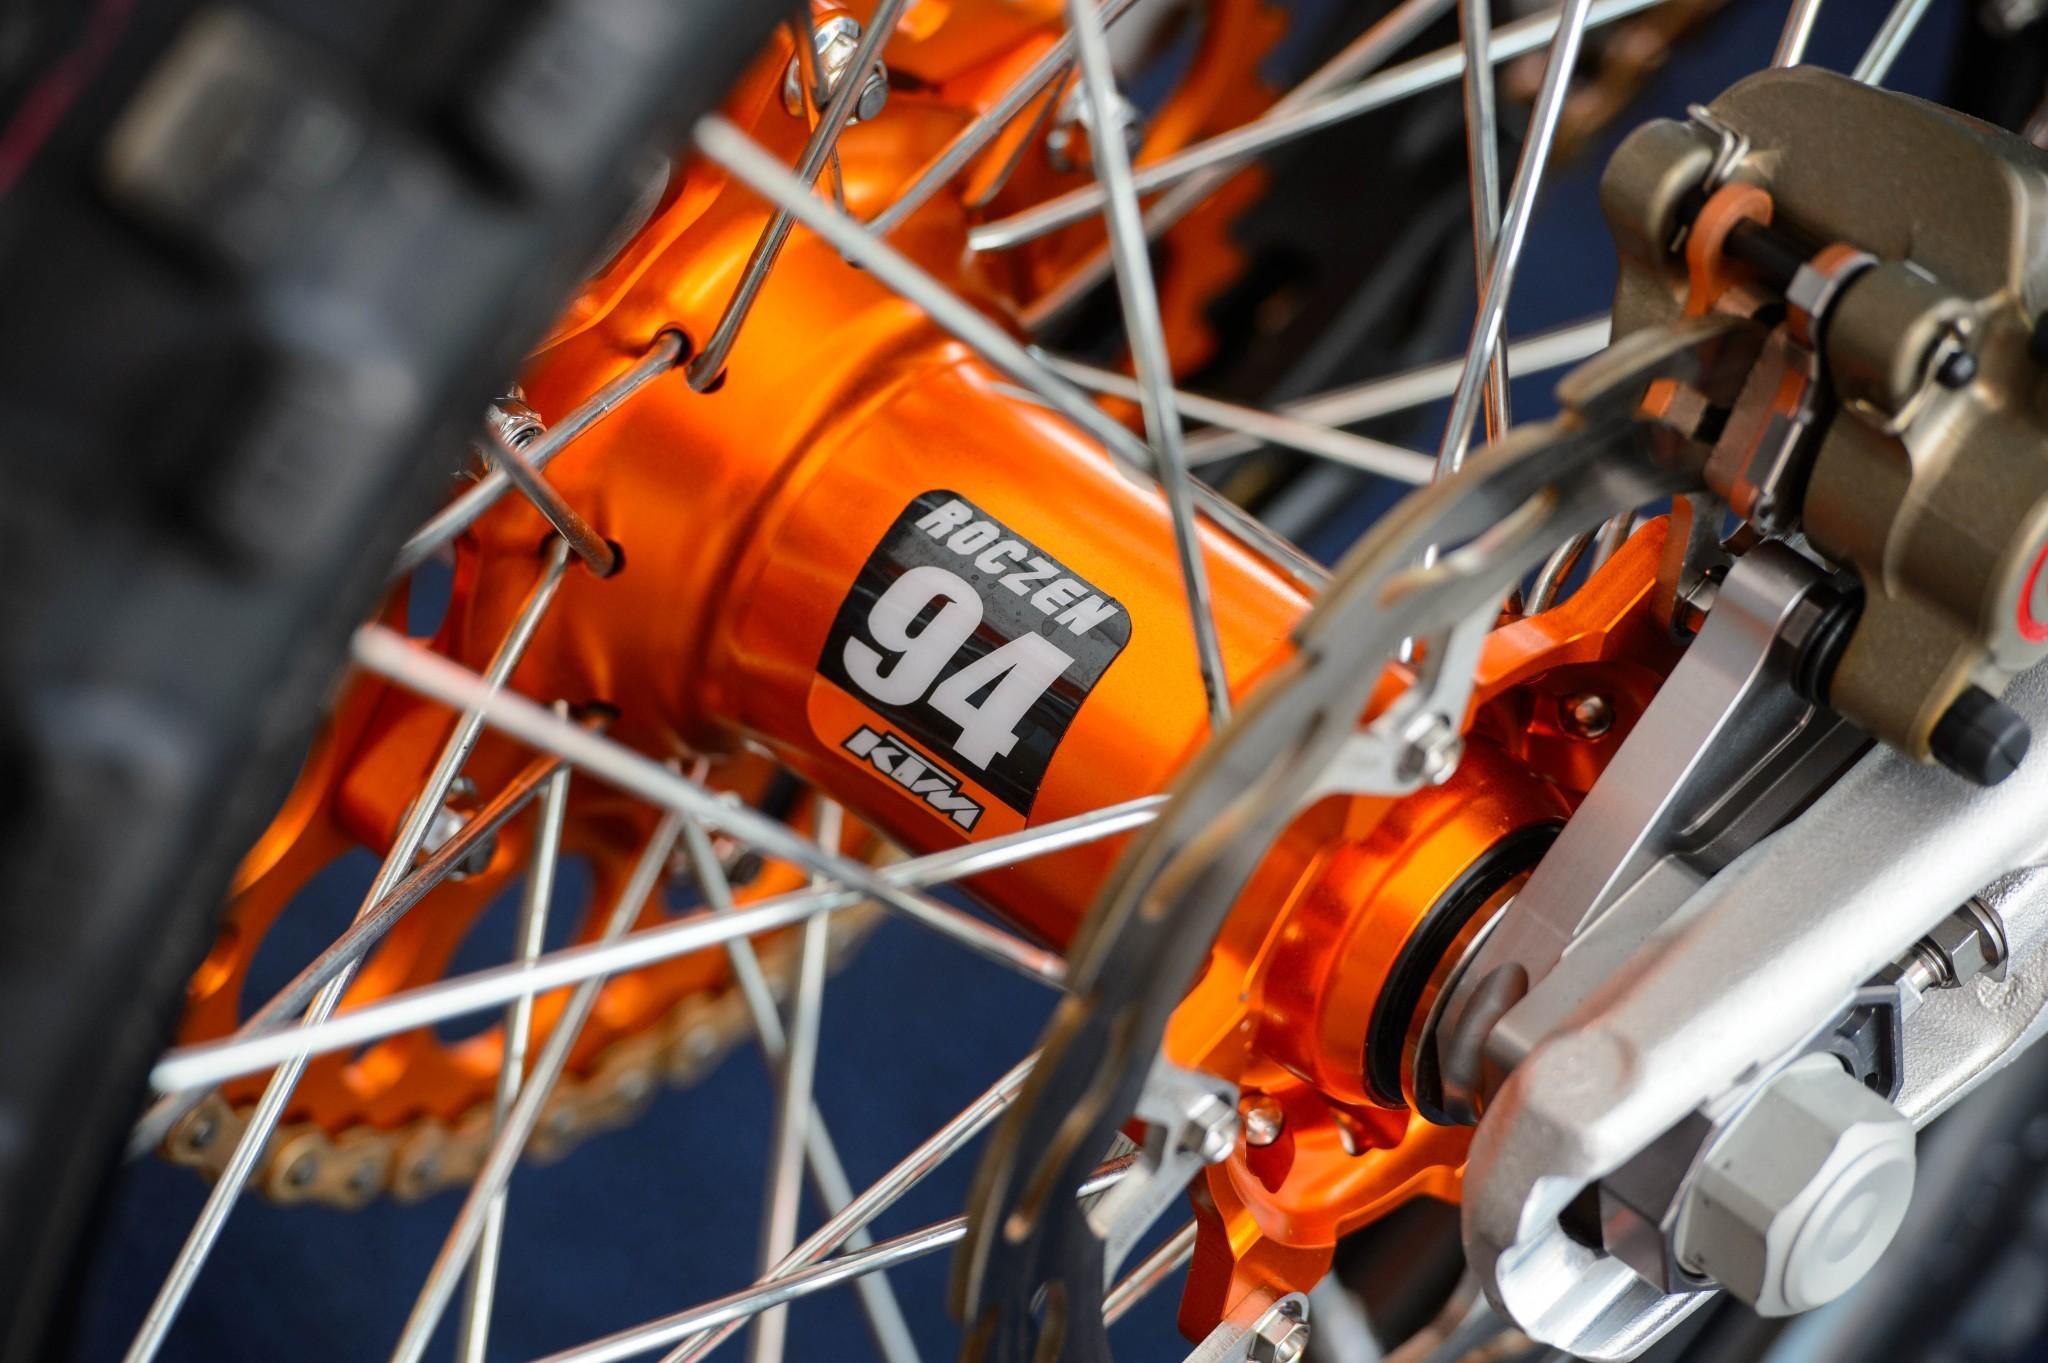 Ktm Bikes Wallpapers: Wallpaper Motocross Ktm ·① WallpaperTag